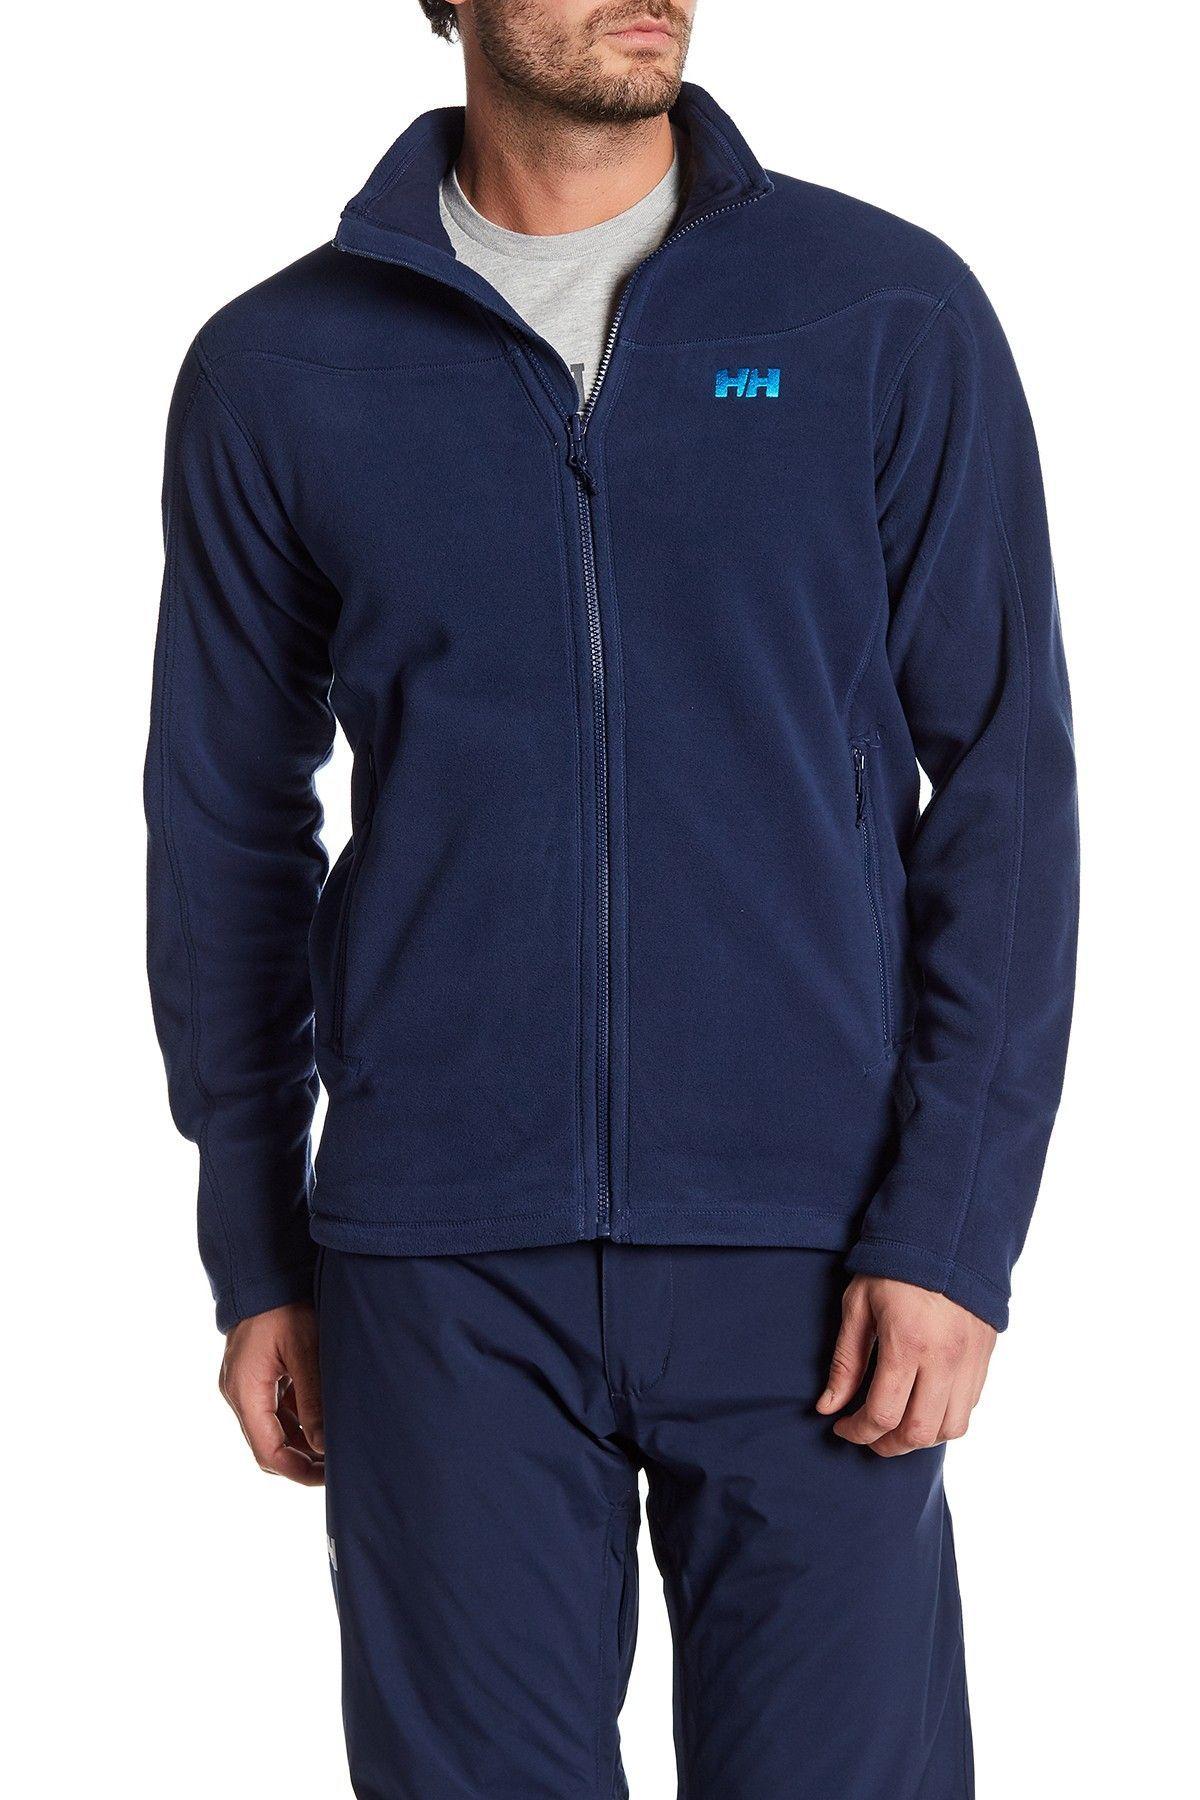 Helly Hansen Mens Velocity Fleece Jacket